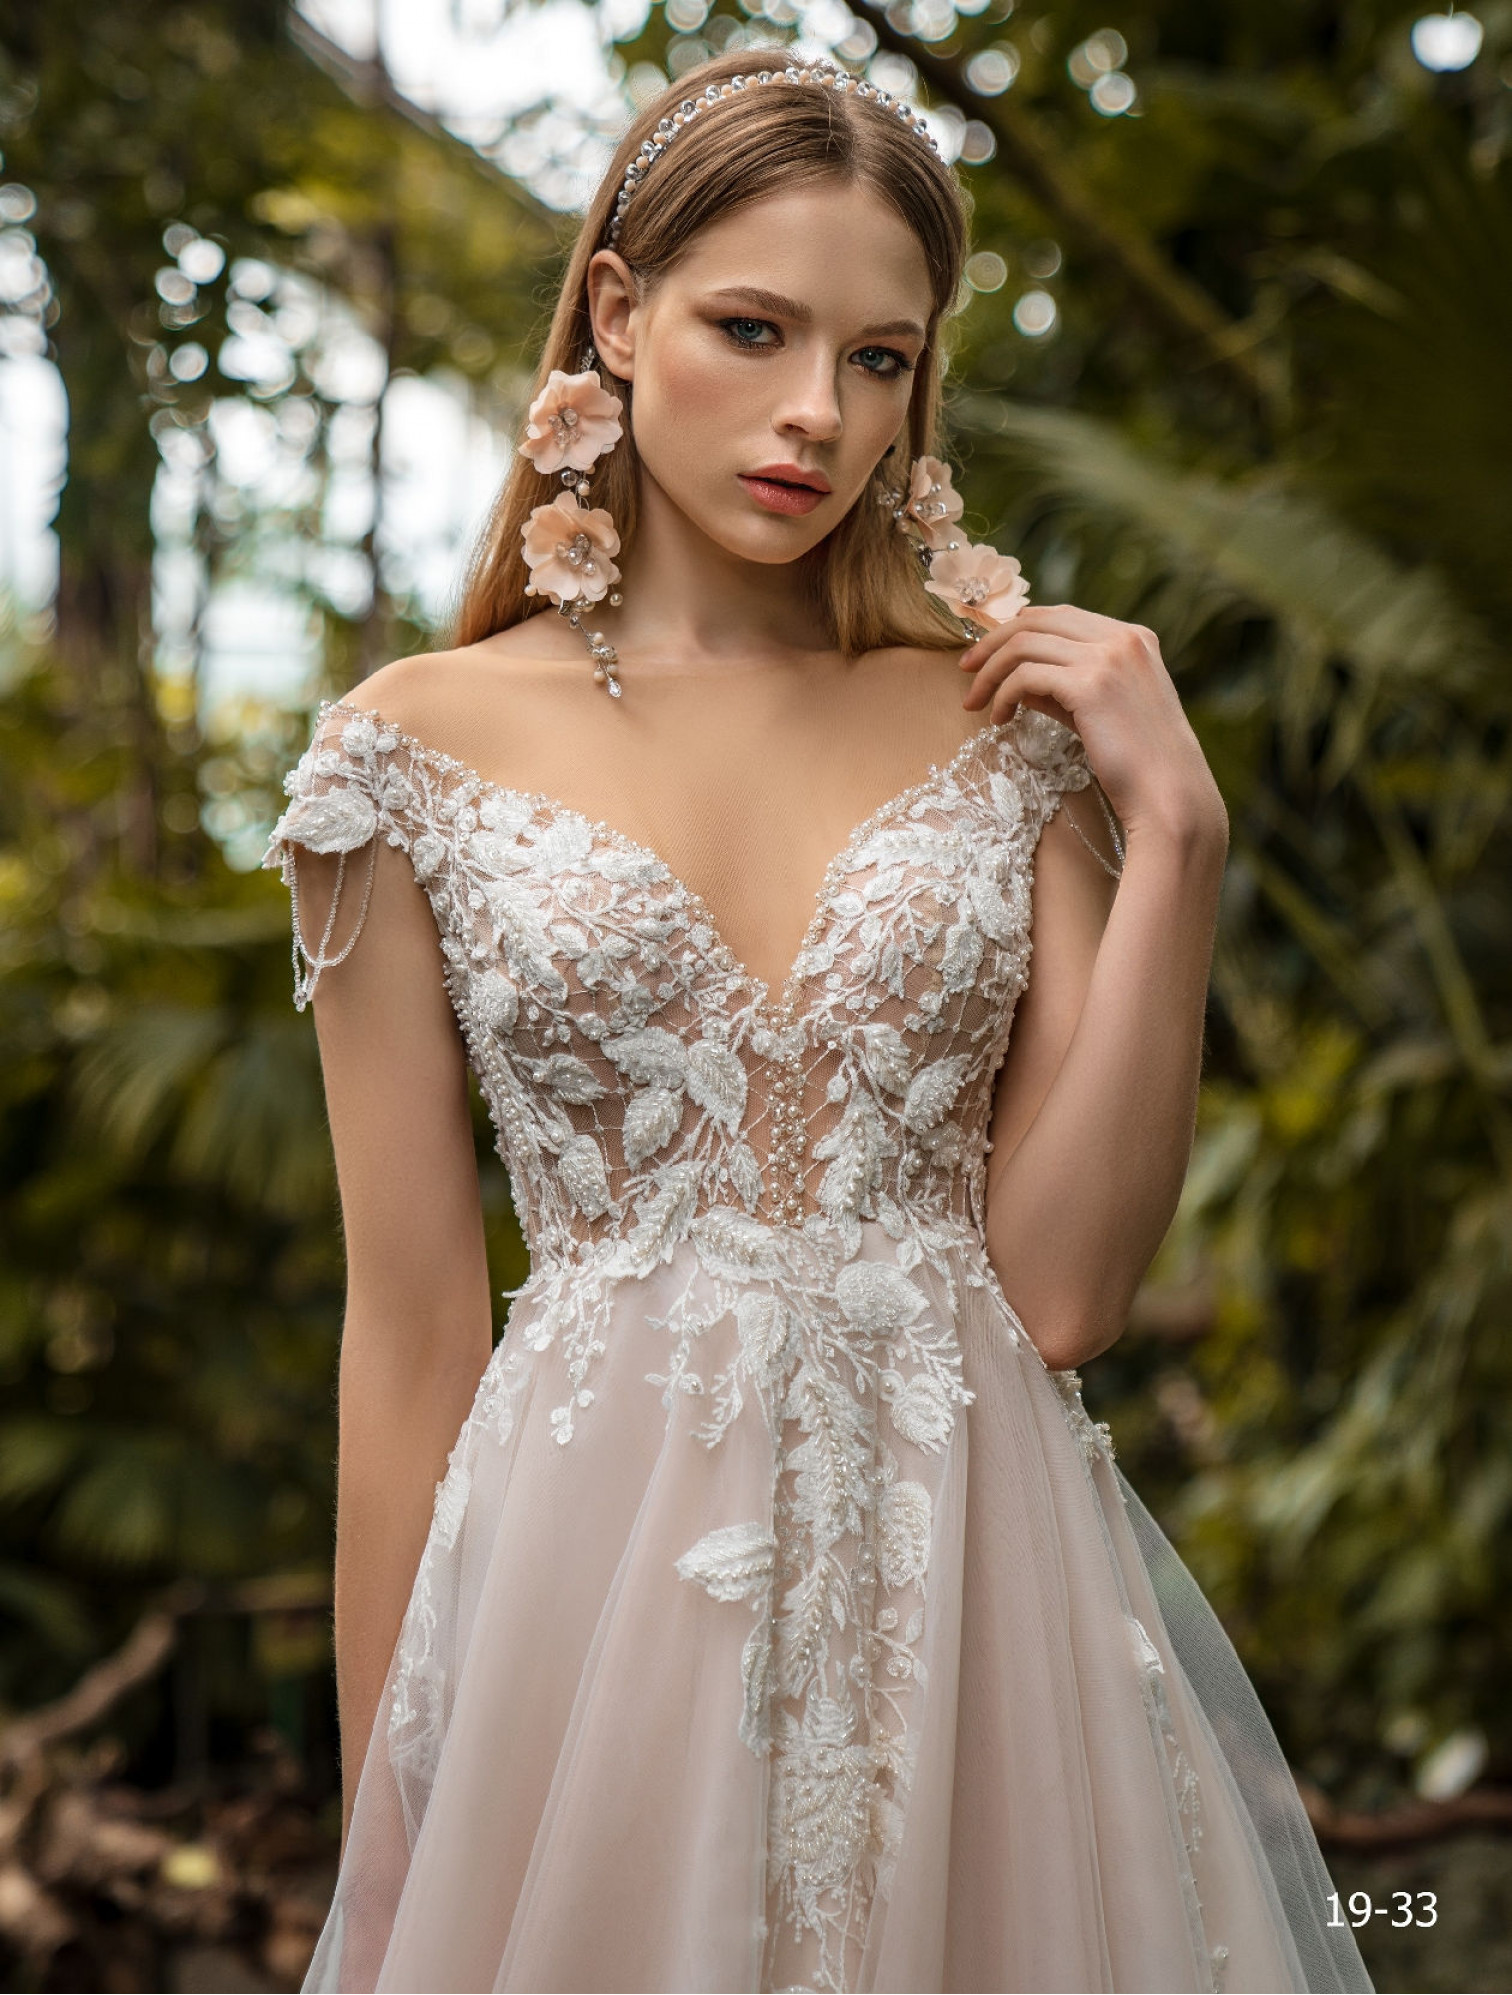 Wedding dress 19-33